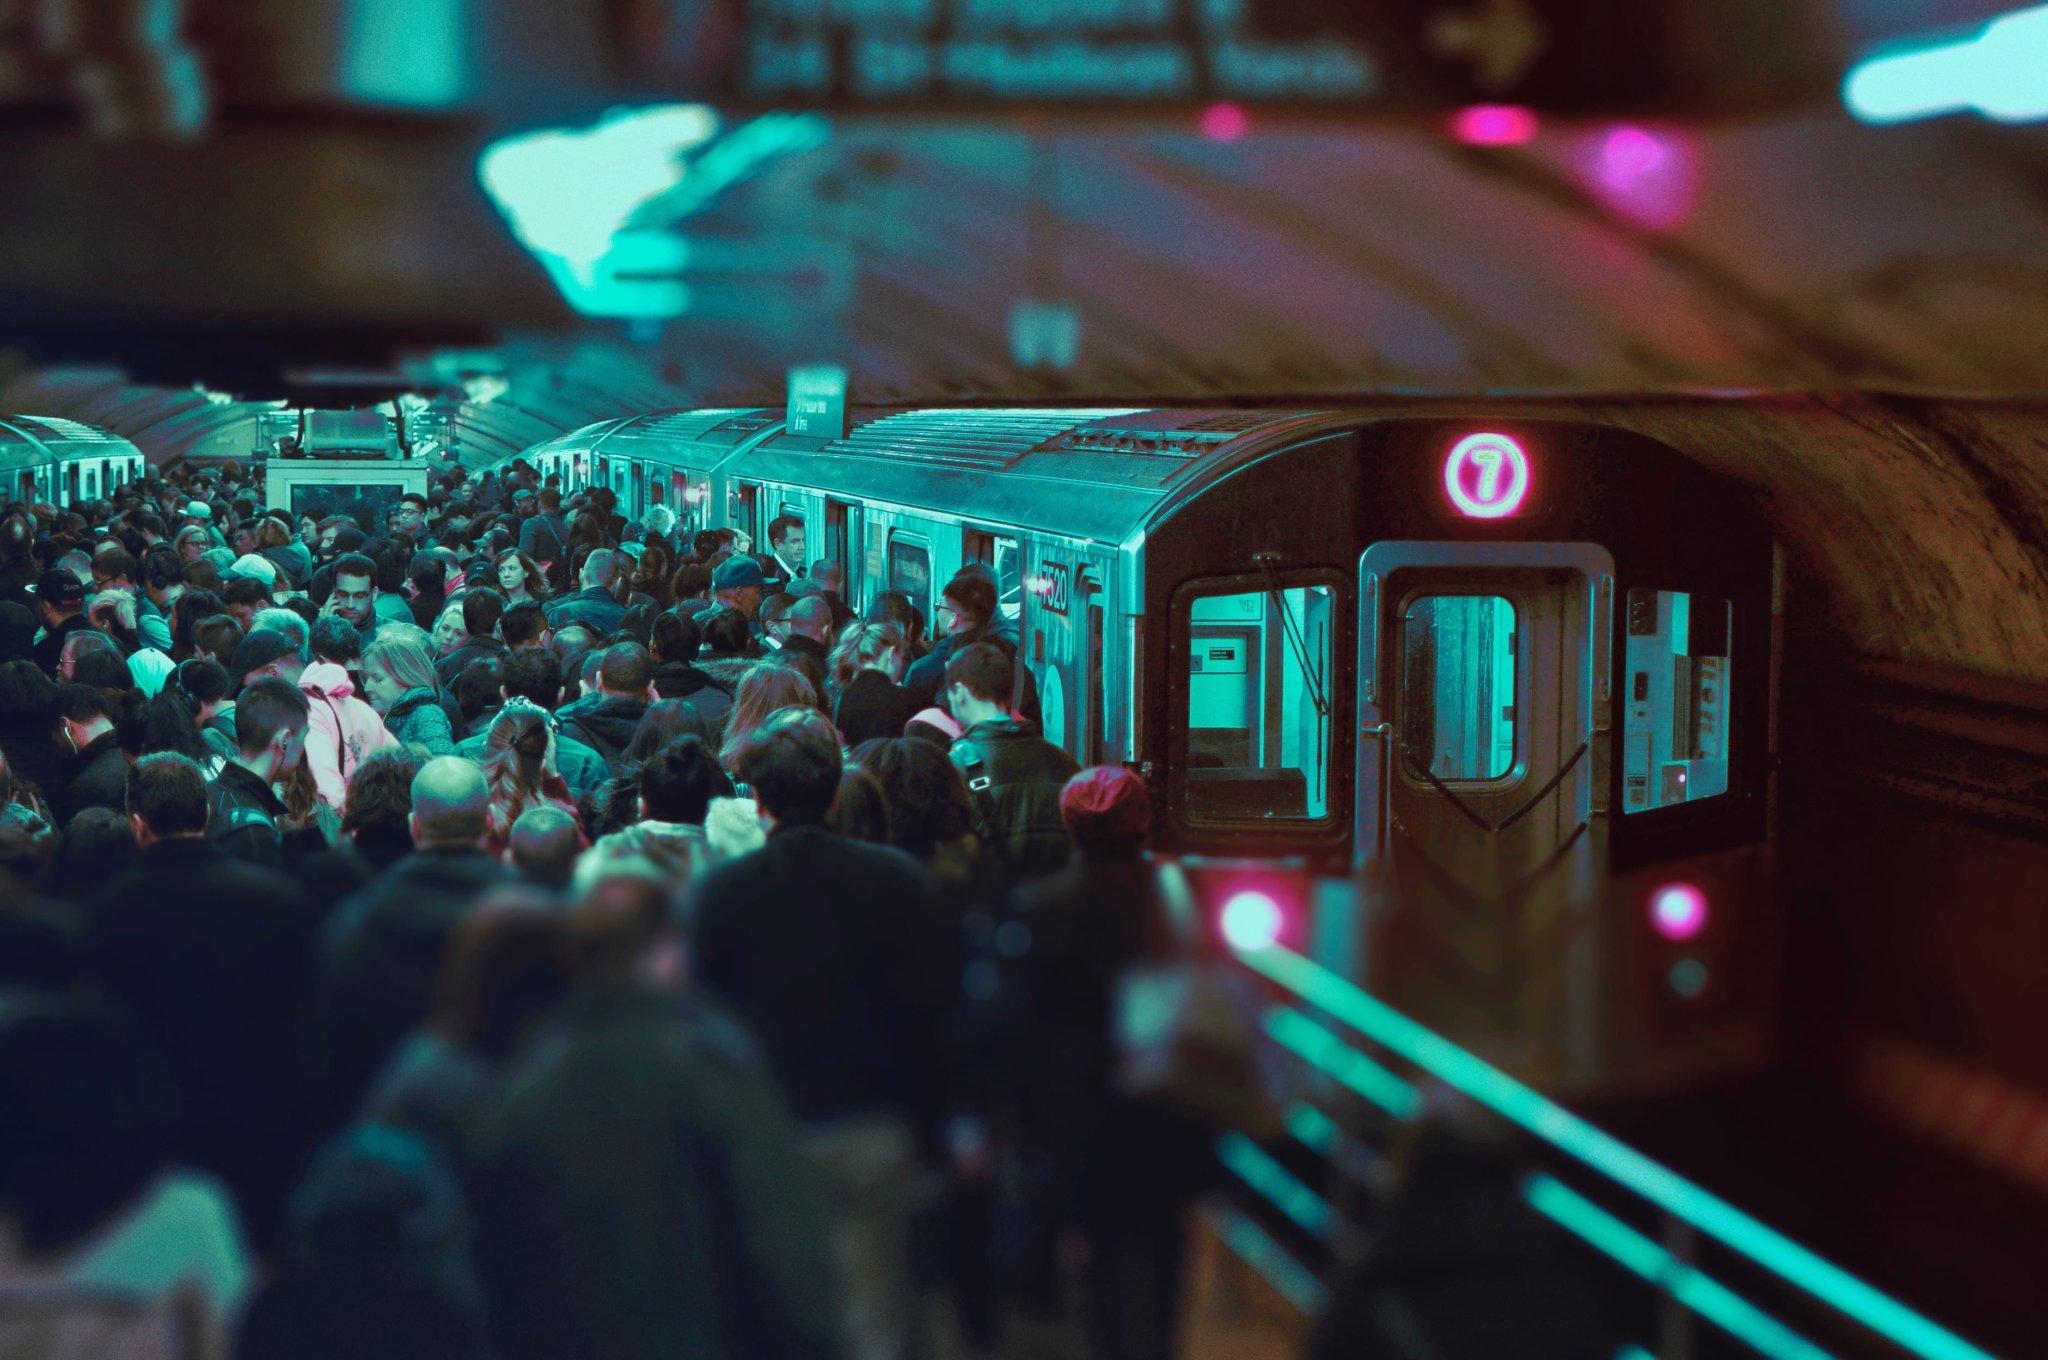 Overpopulated train